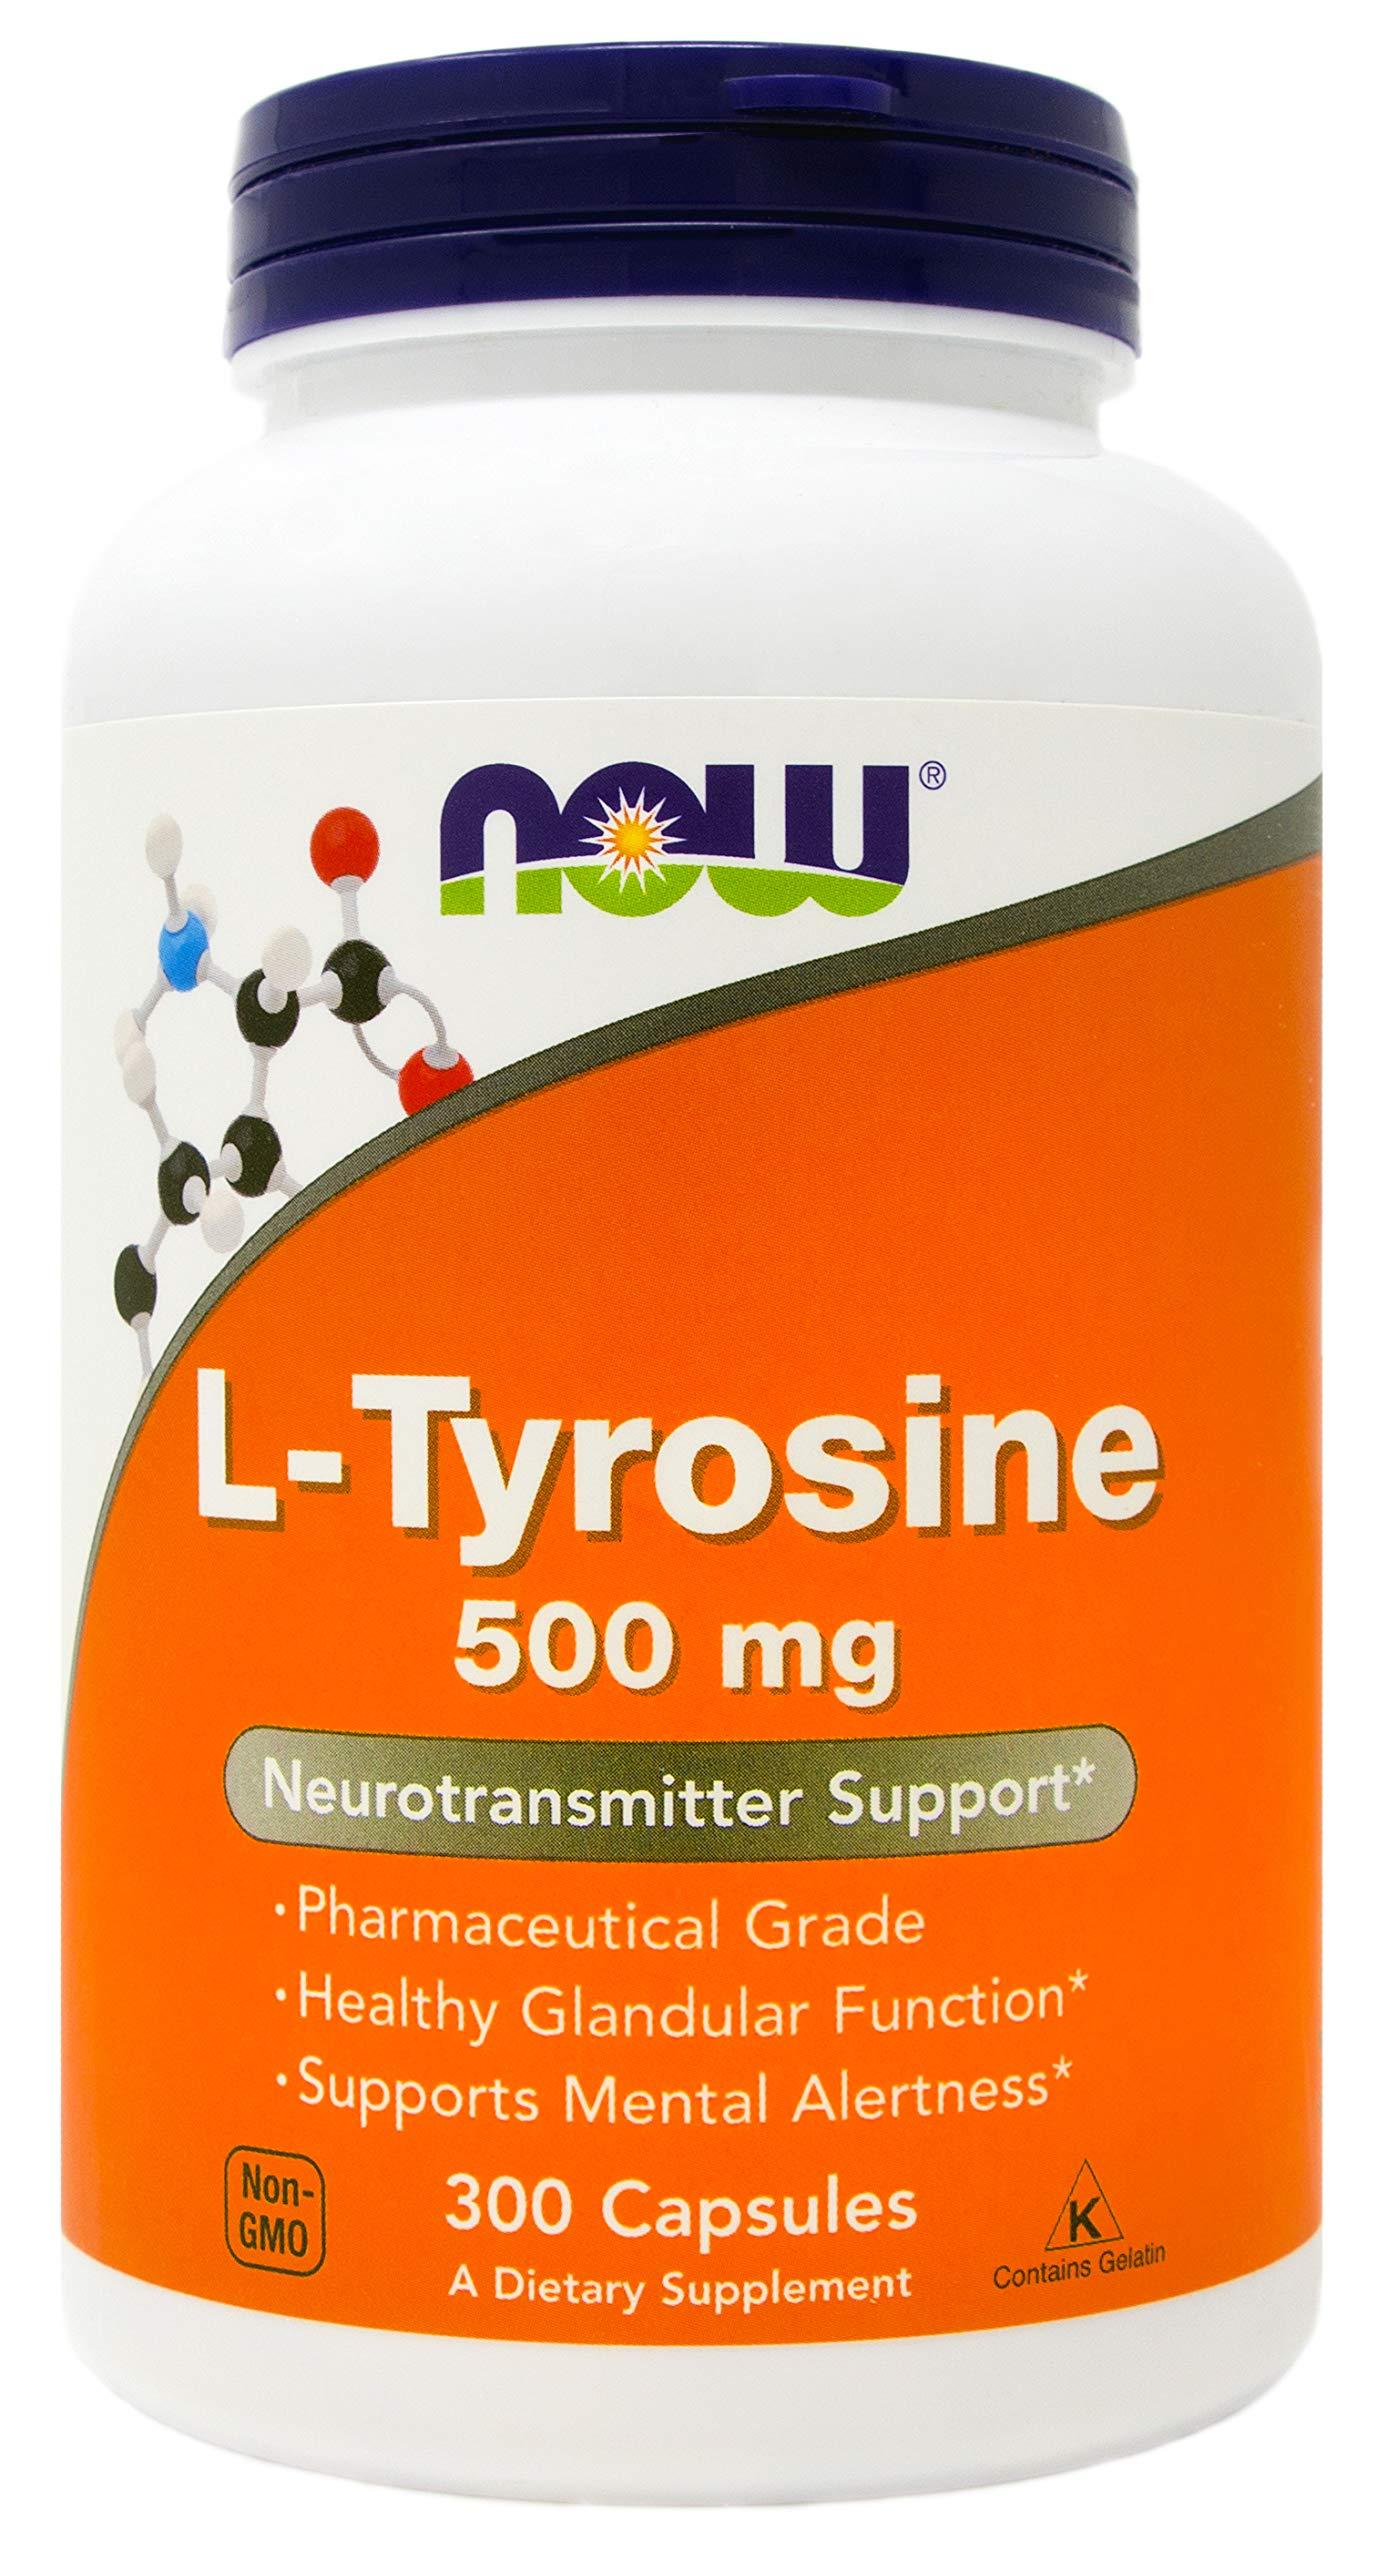 Now L-Tyrosine 500mg, 300 Capsules